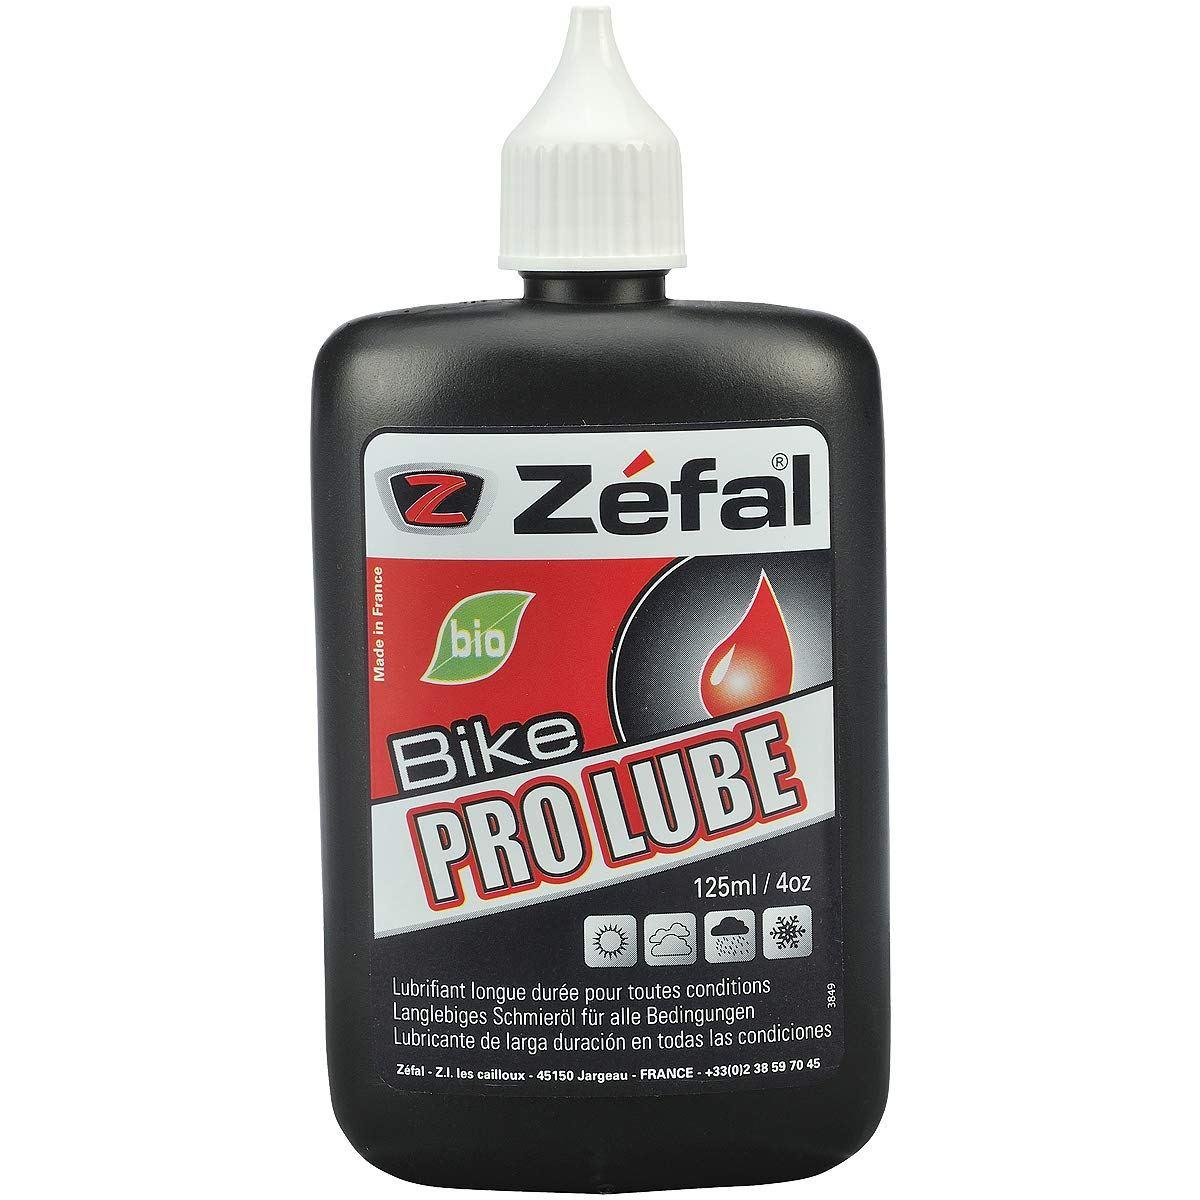 zefal pro lube bisiklet yağı